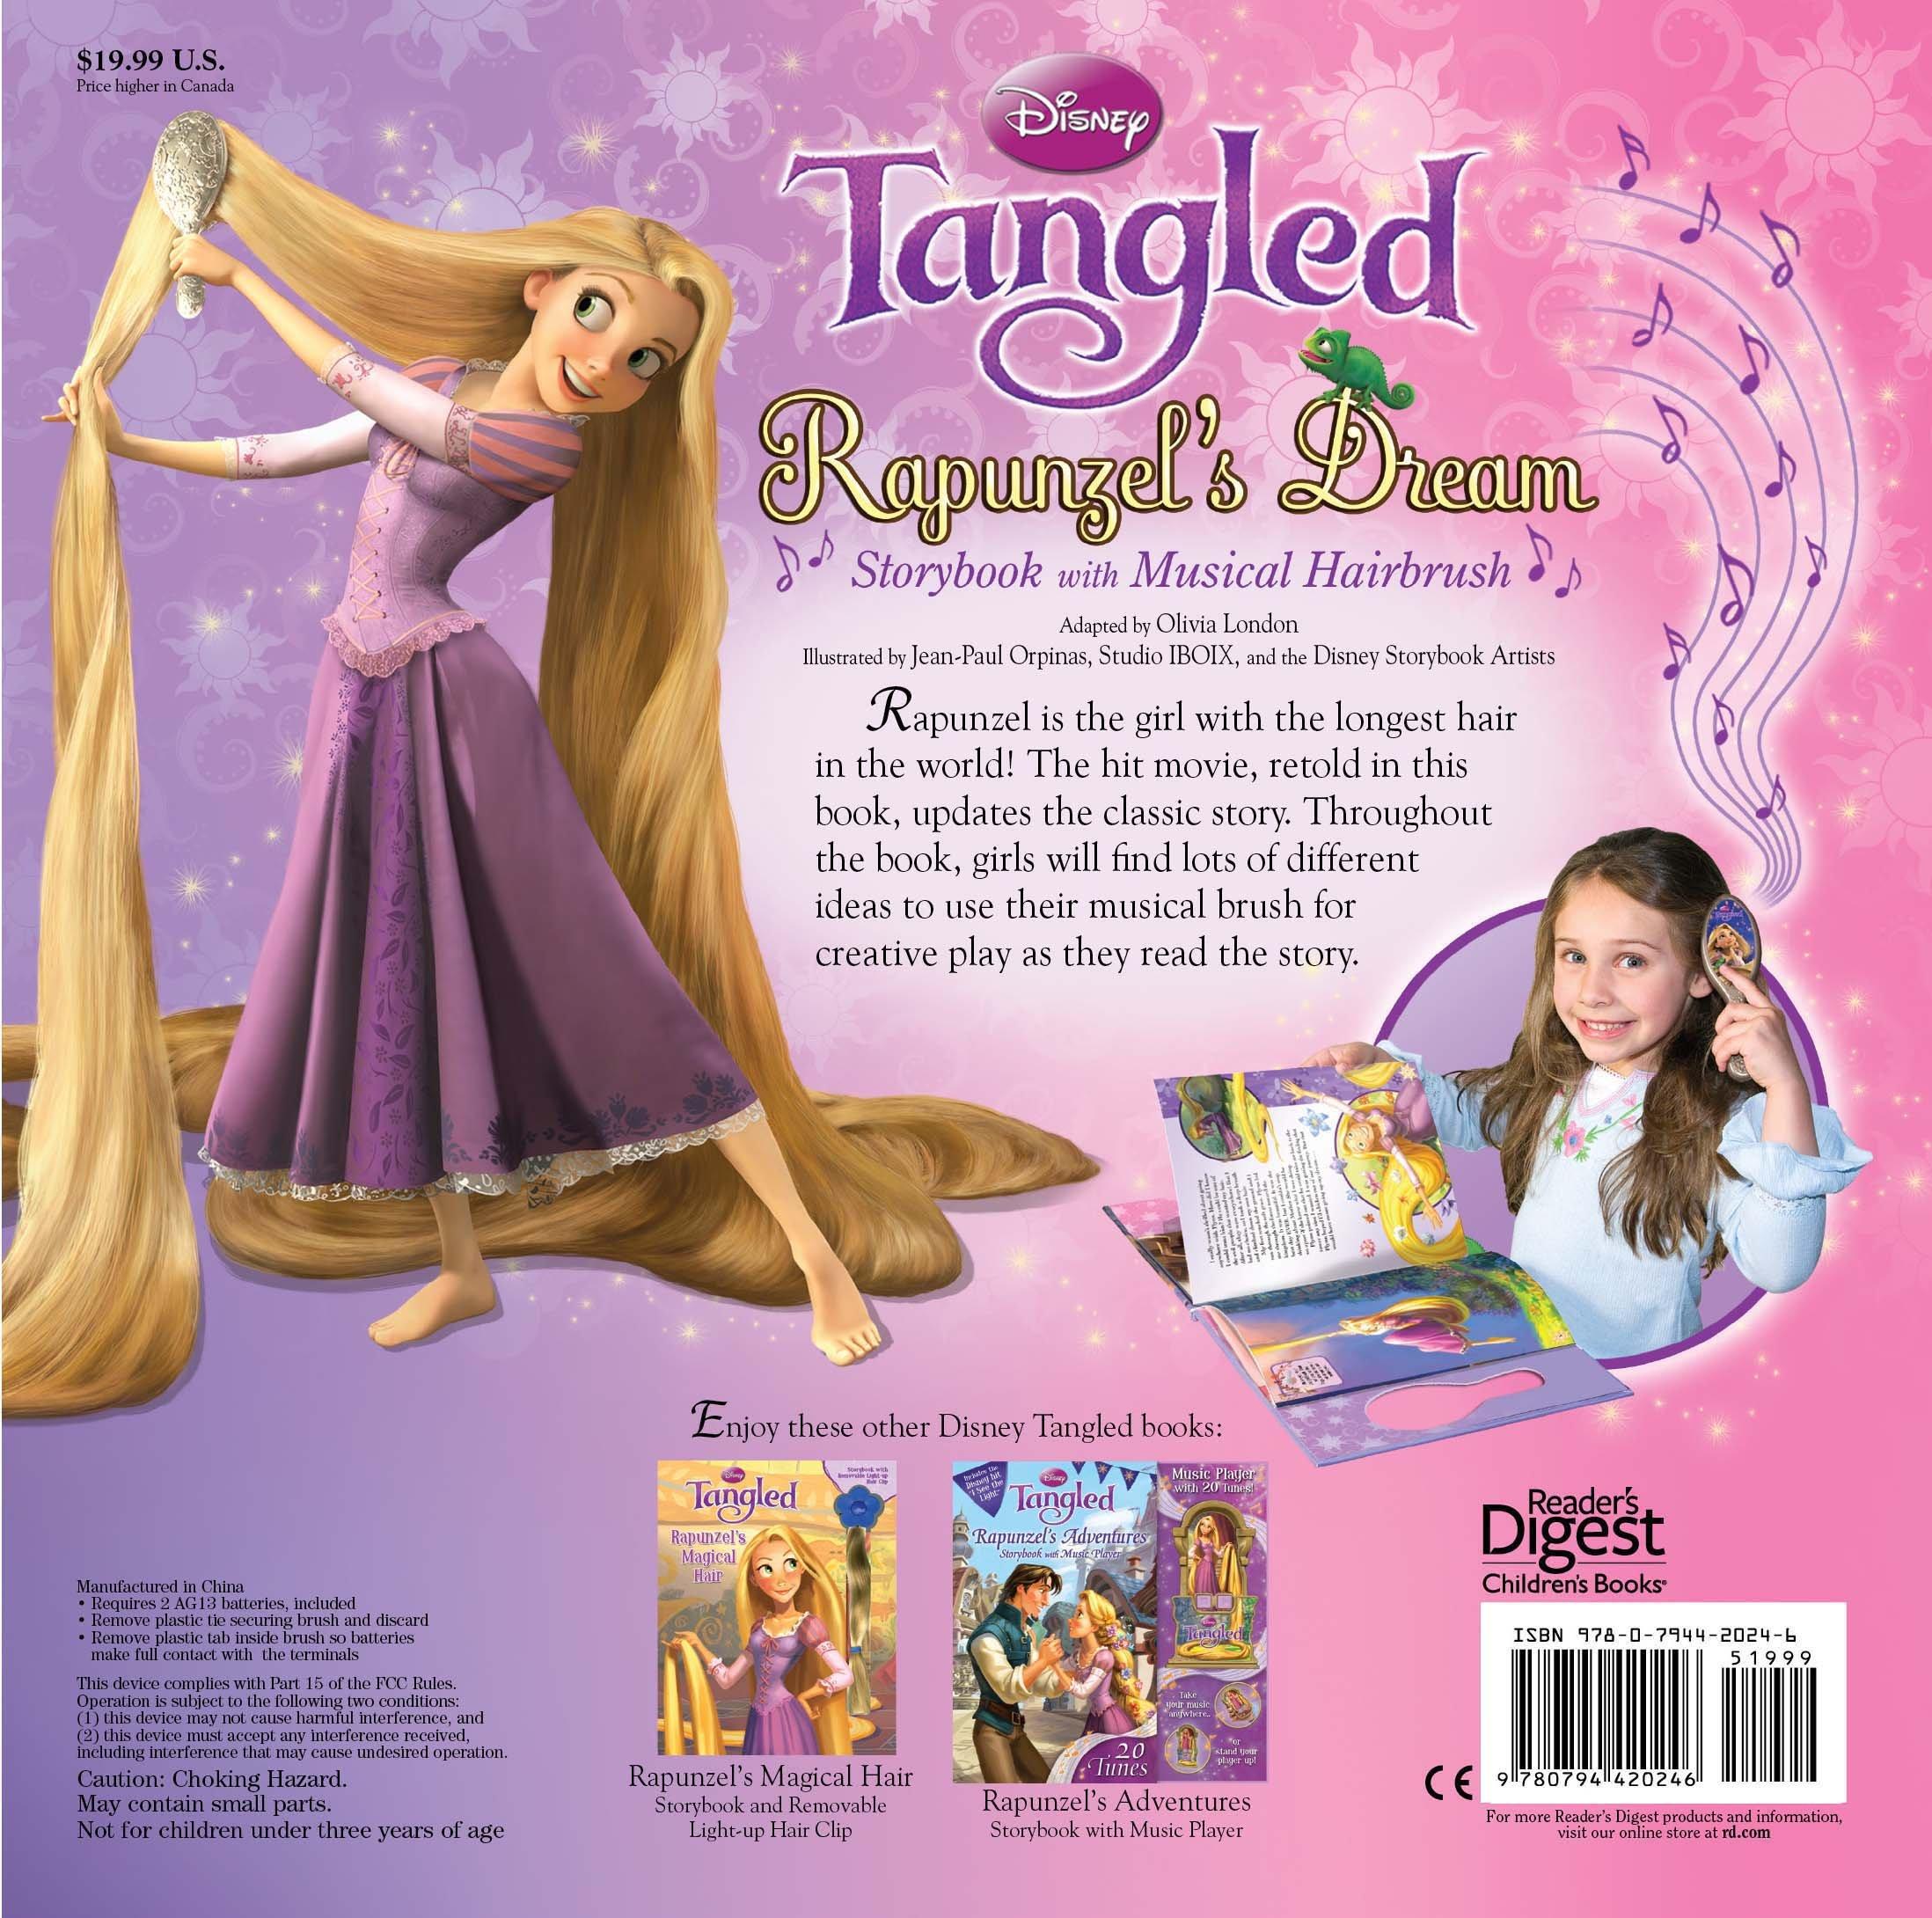 Disney Tangled Rapunzel S Dream Storybook With Musical Hairbrush Disney Storybook Artists Disney Princess 9780794420246 Amazon Com Books